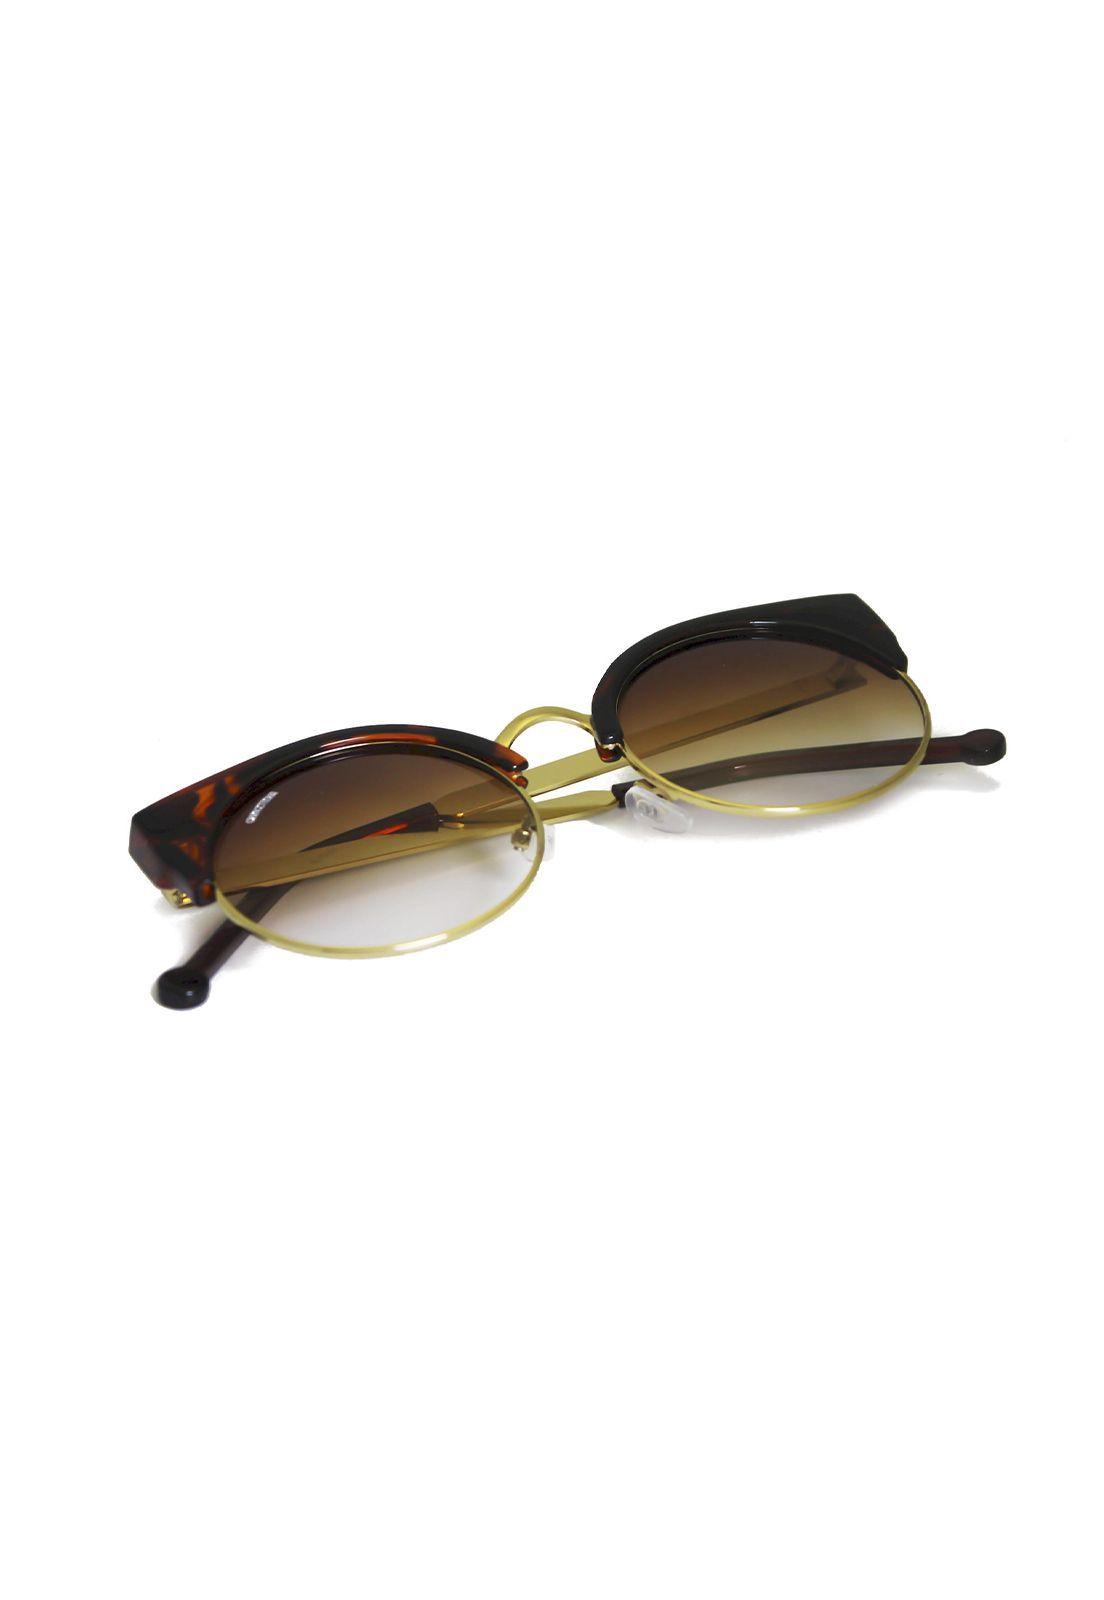 Óculos de Sol Grungetteria Miss Kitty Onça